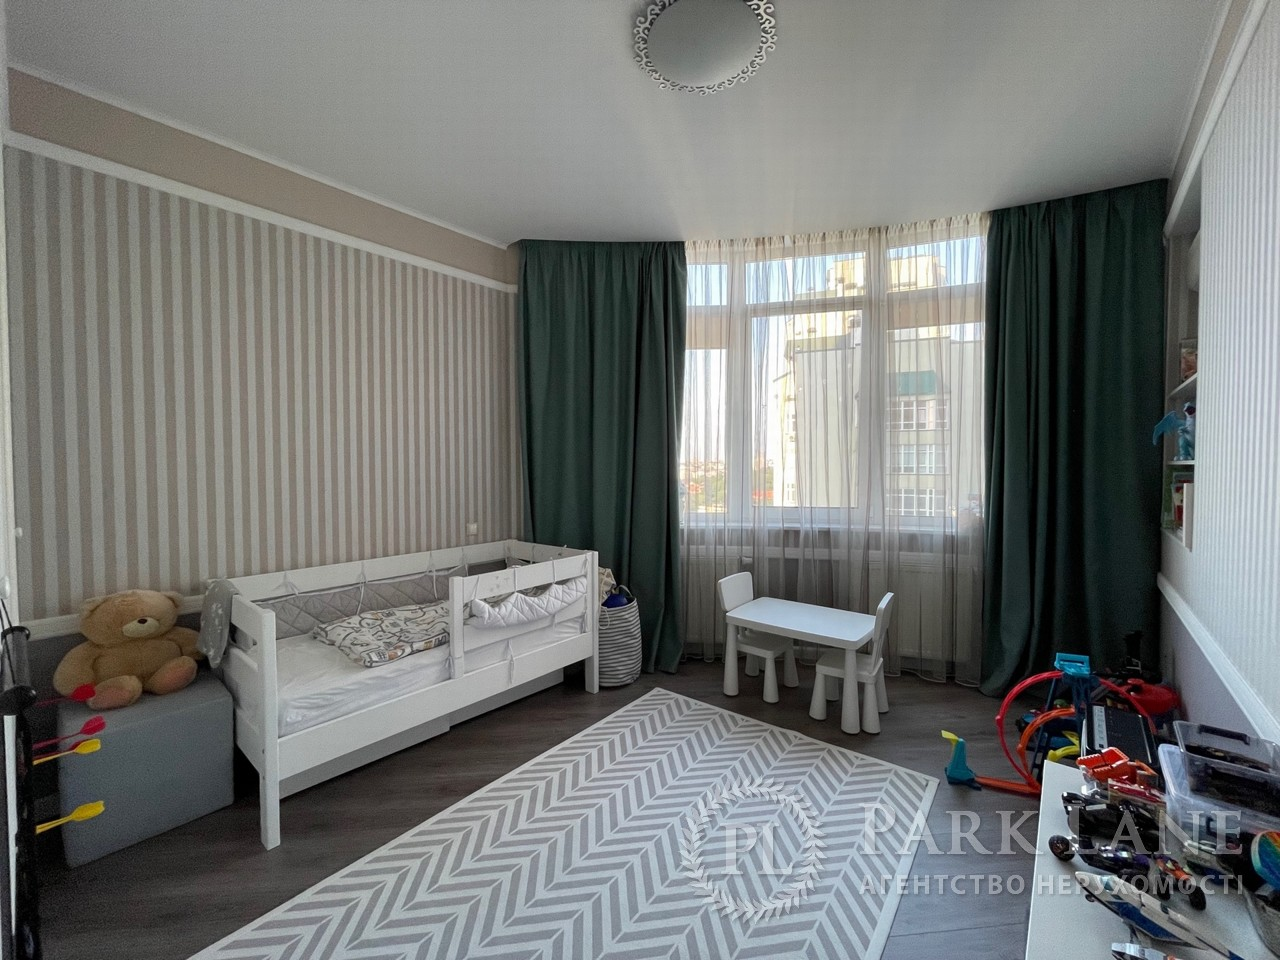 Квартира ул. Механизаторов, 2, Киев, B-102859 - Фото 11